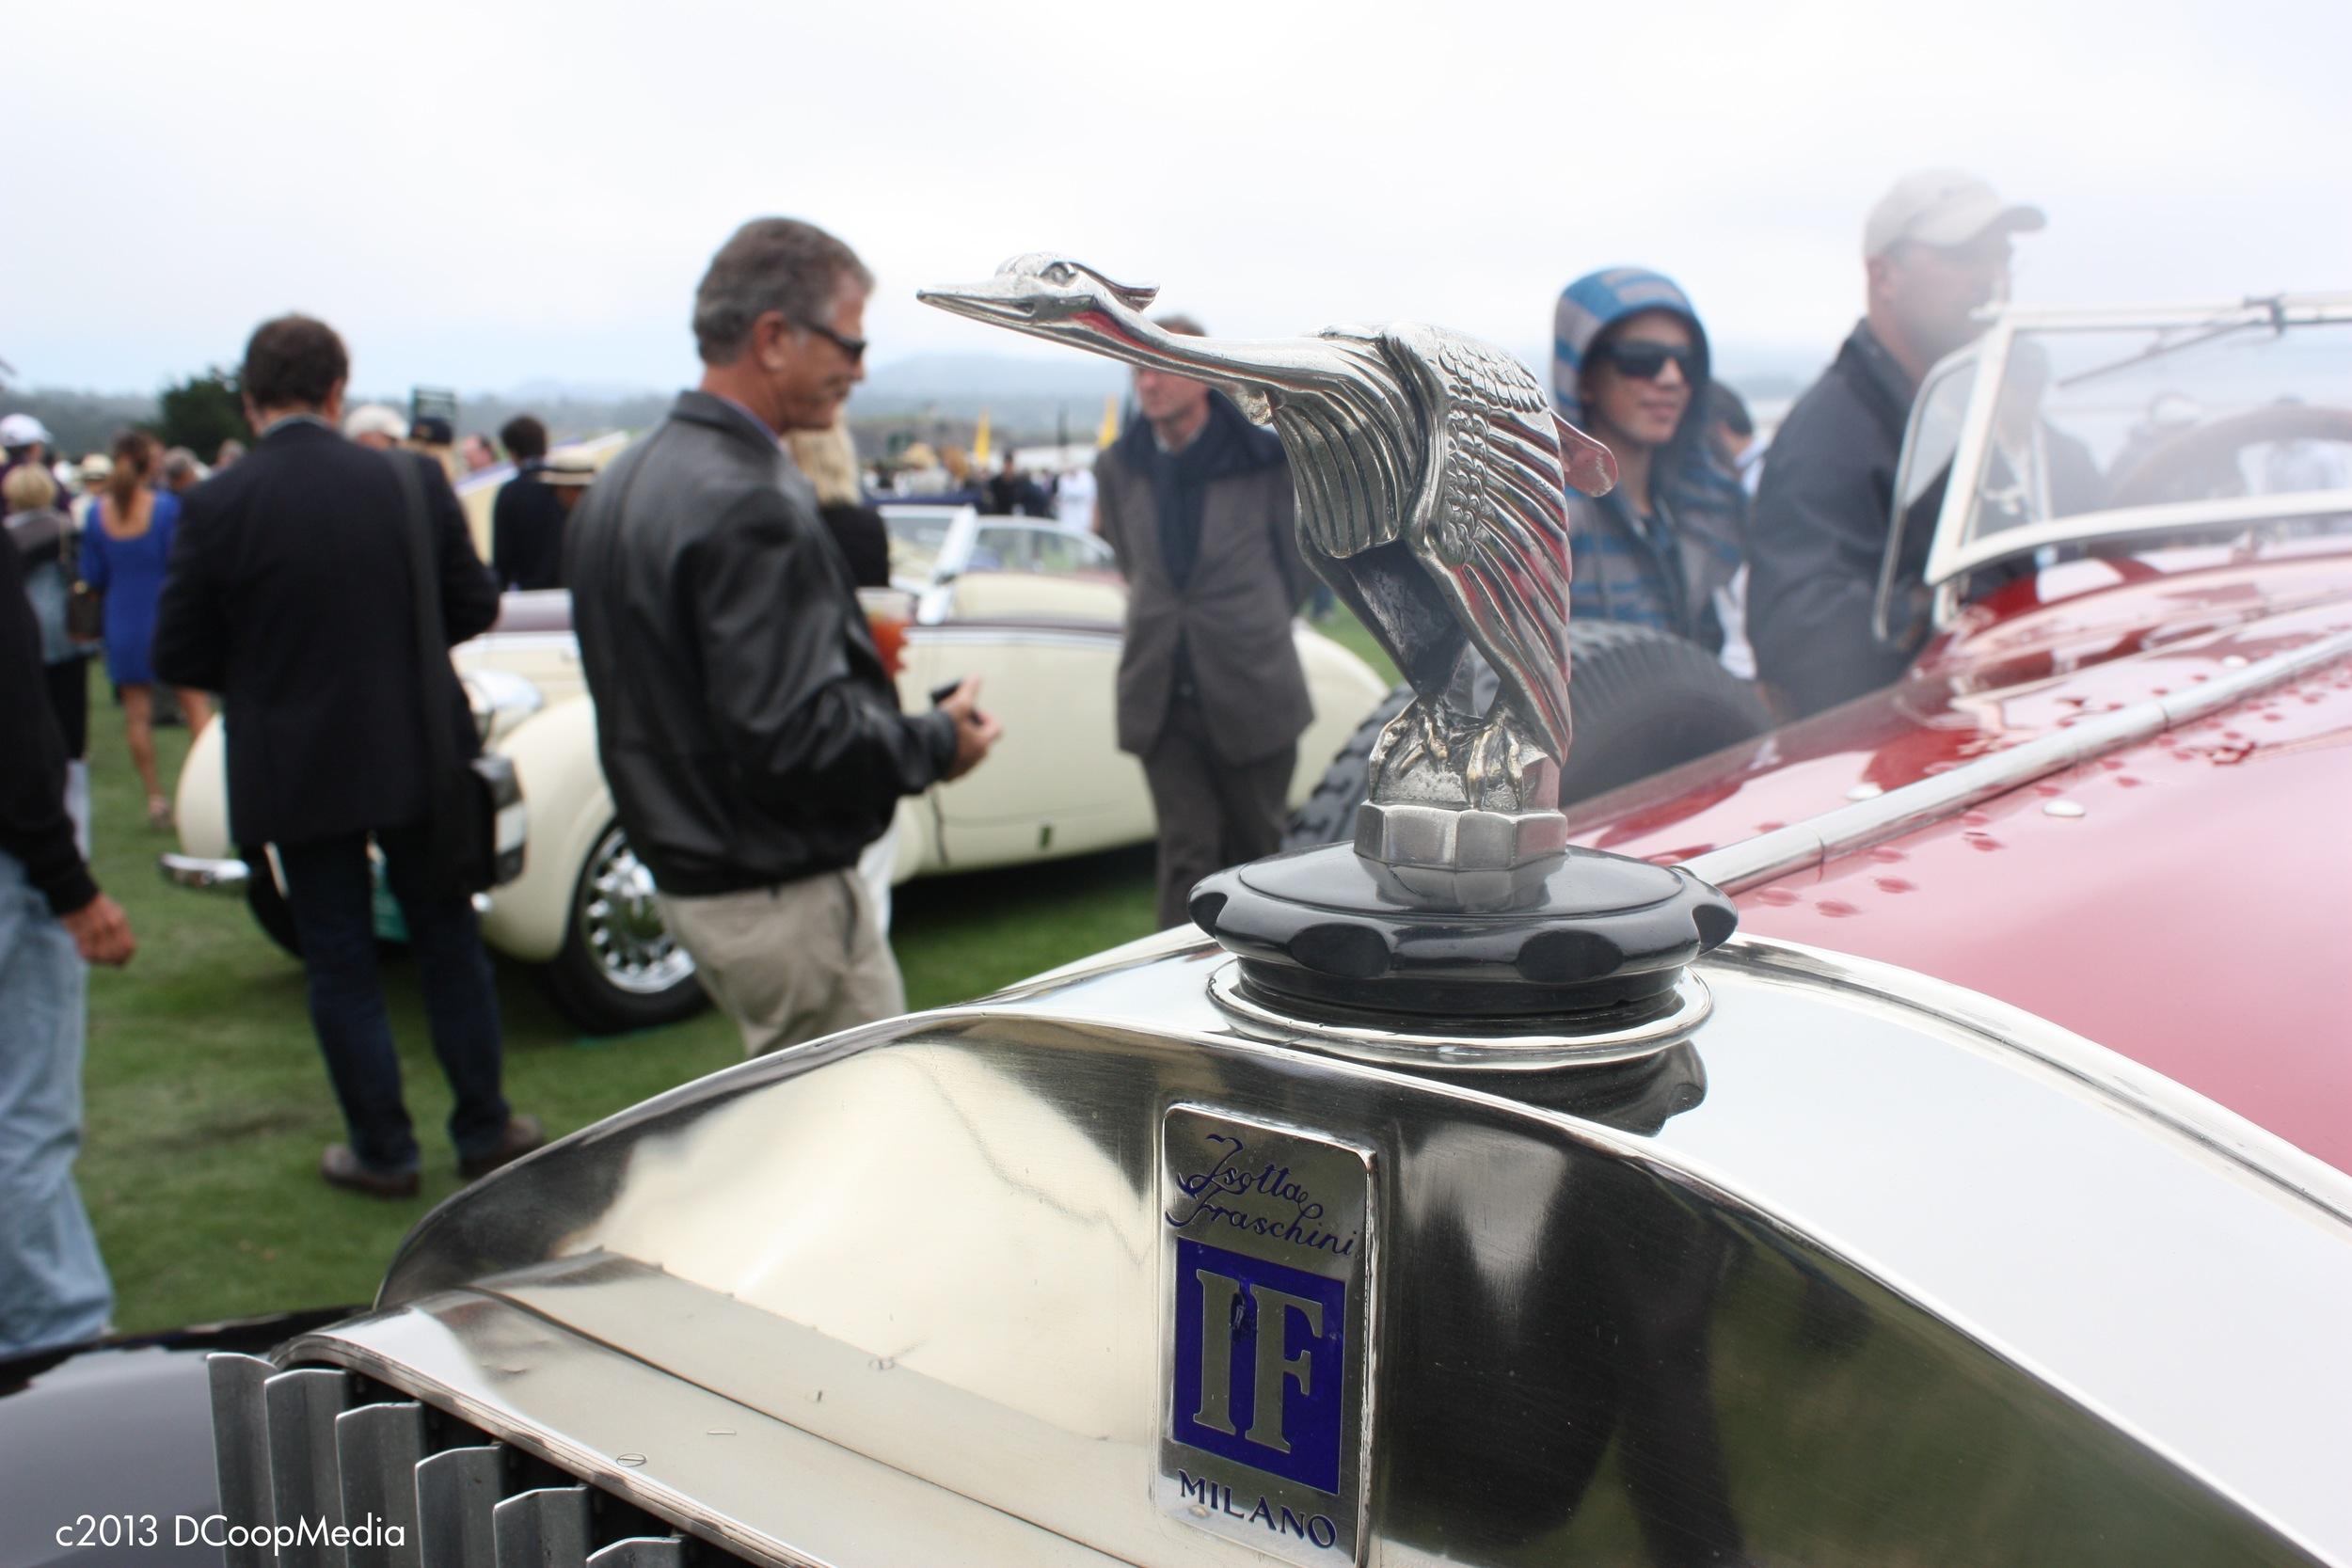 25 Isotta Fraschini Tipo 8A S Corsica Boattail Speedster.jpg